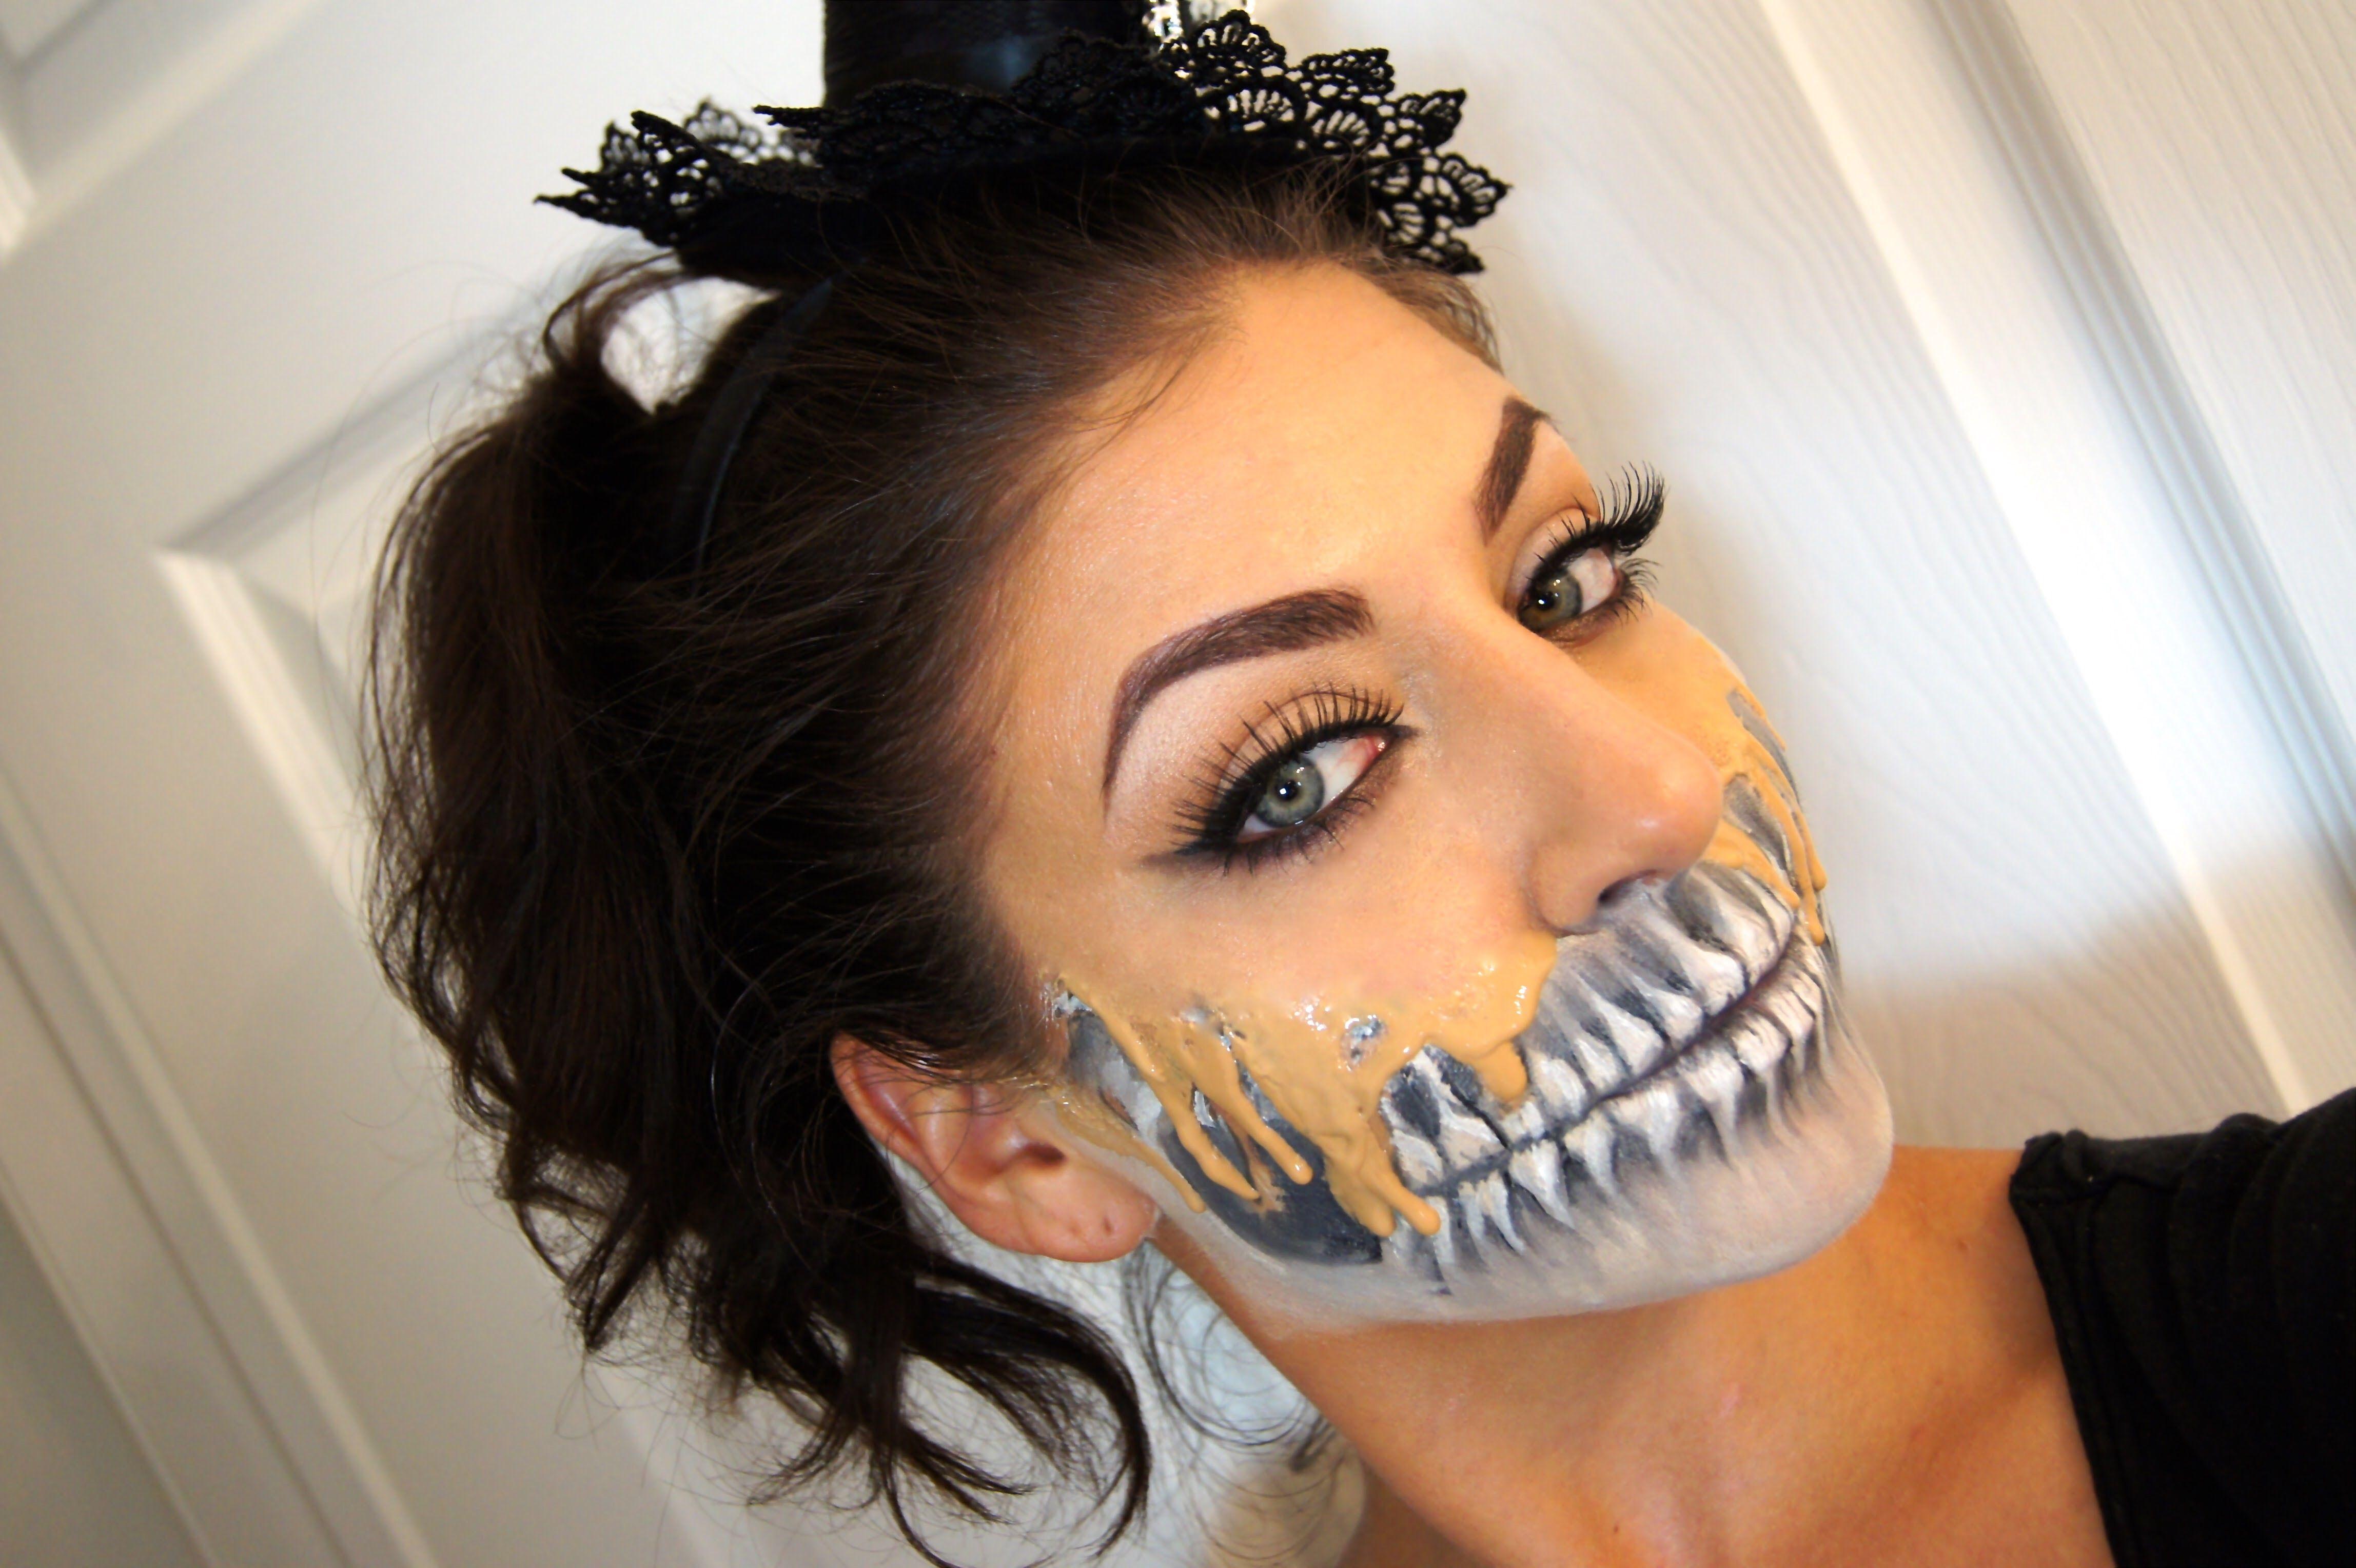 SFX makeup by Alyssa DelTorre